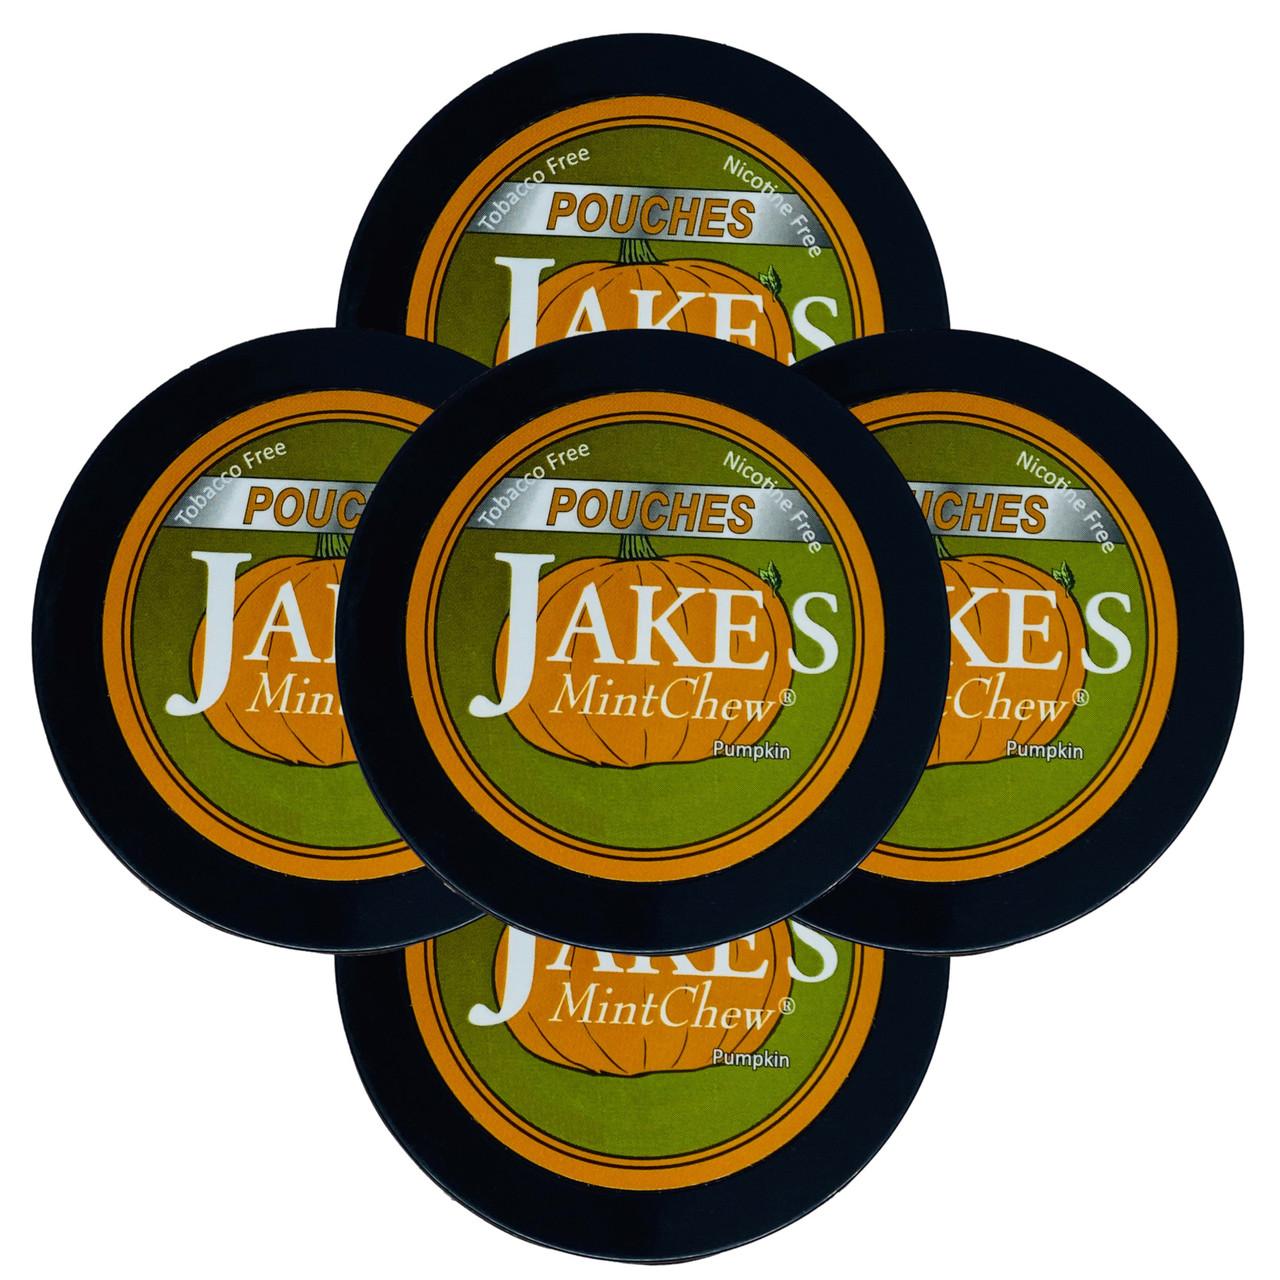 Jake's Mint Chew Pouches Pumpkin 5 Cans